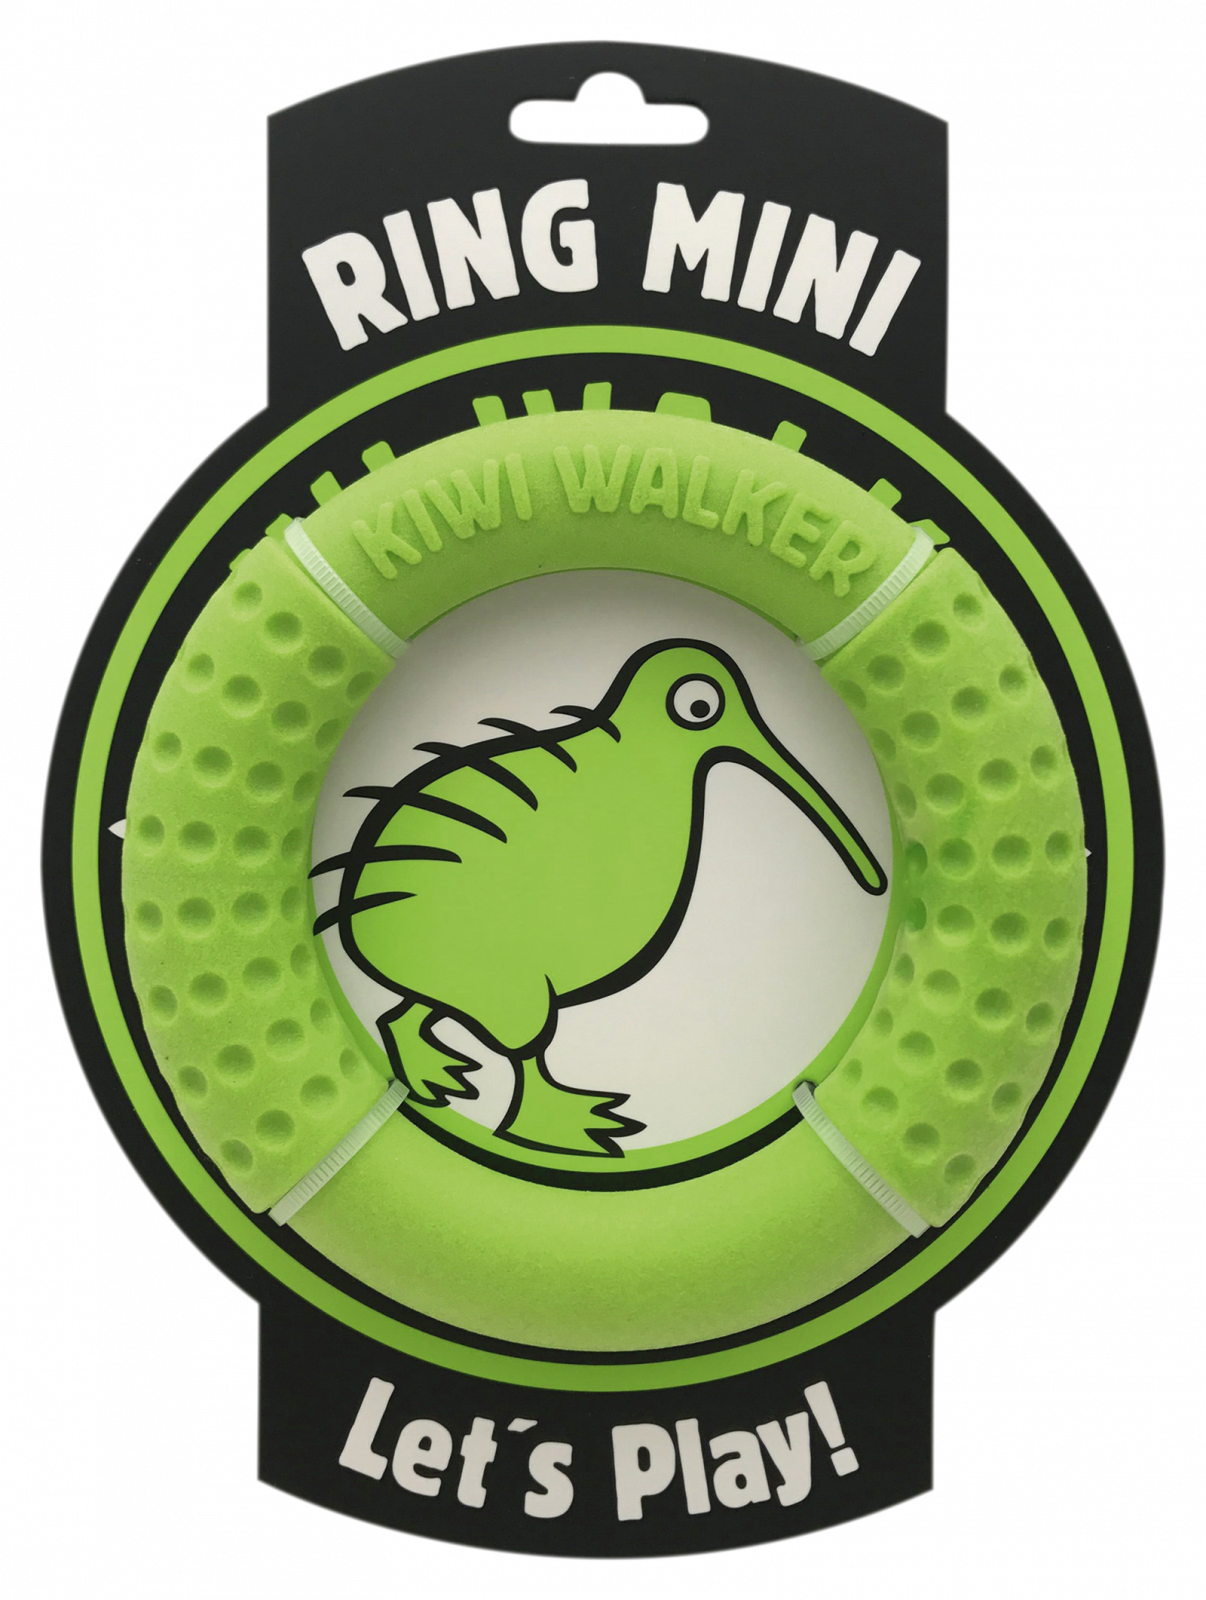 KiwiWalker Let's play! RING MINI green (13cm)